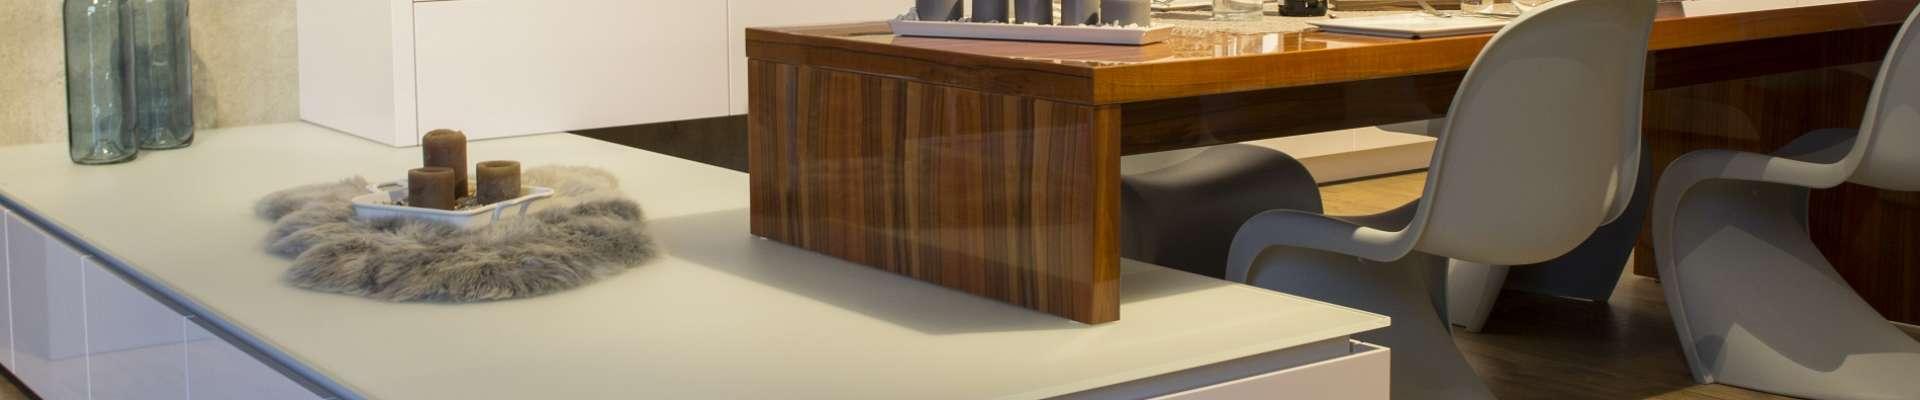 karriere bei miele maier in ravensburg. Black Bedroom Furniture Sets. Home Design Ideas